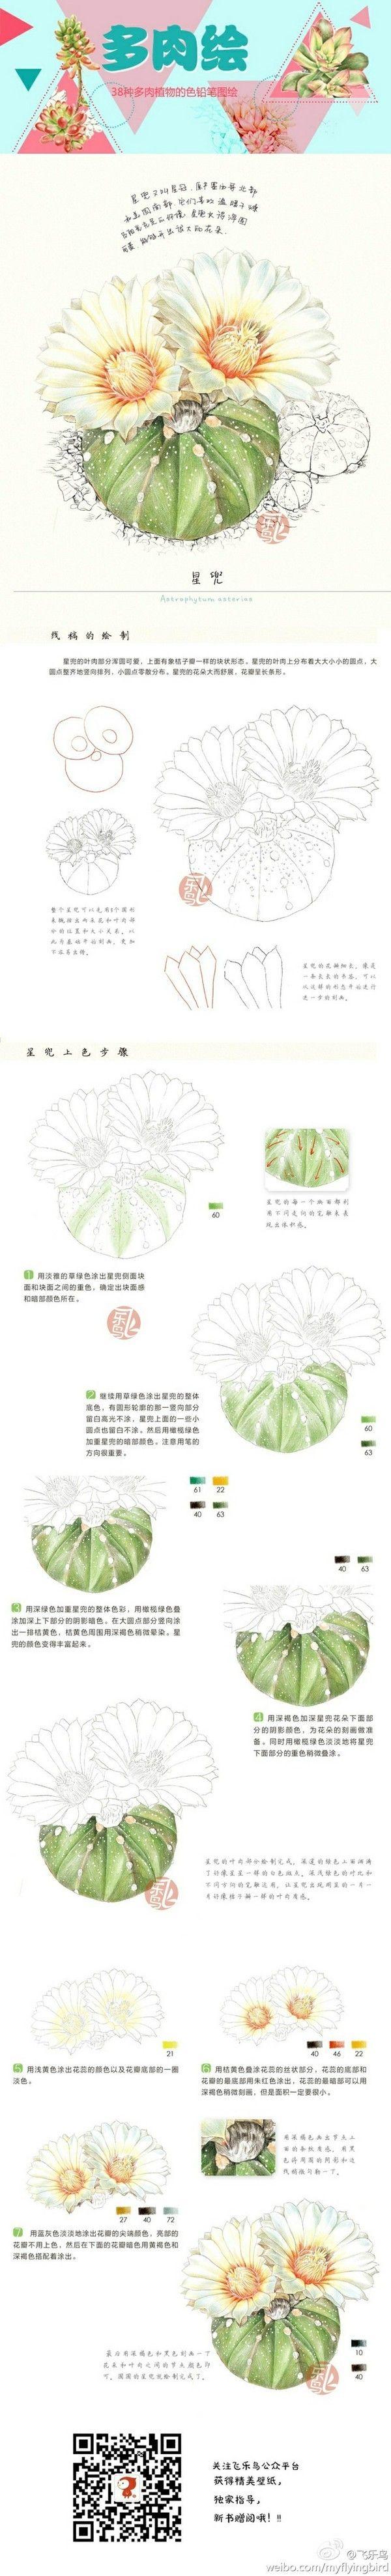 Watercolor or colored pencil succulent